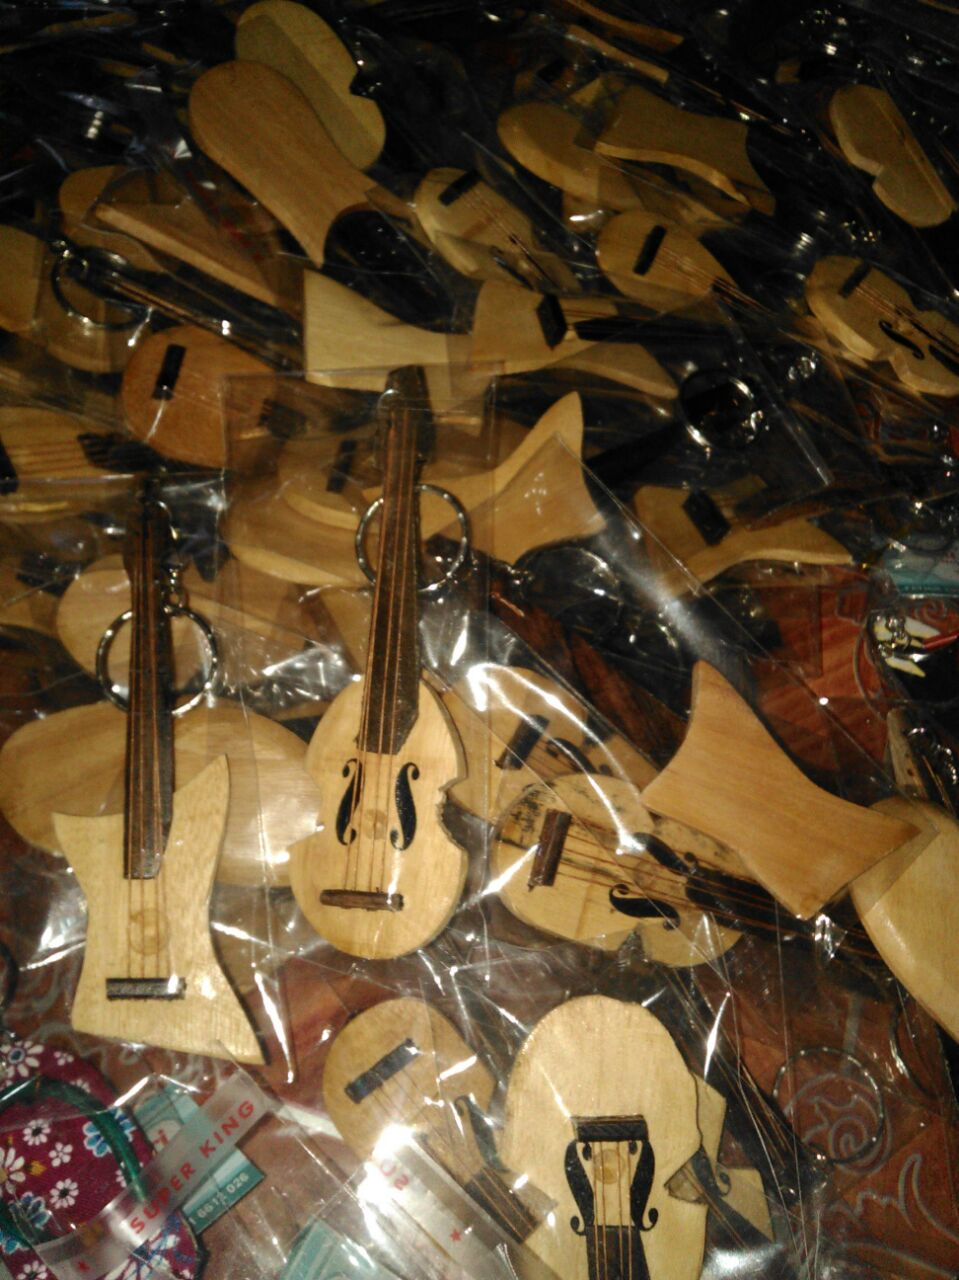 Souvenir Gantungan Kunci Gitar Pusat Fashion Dan Aksesoris